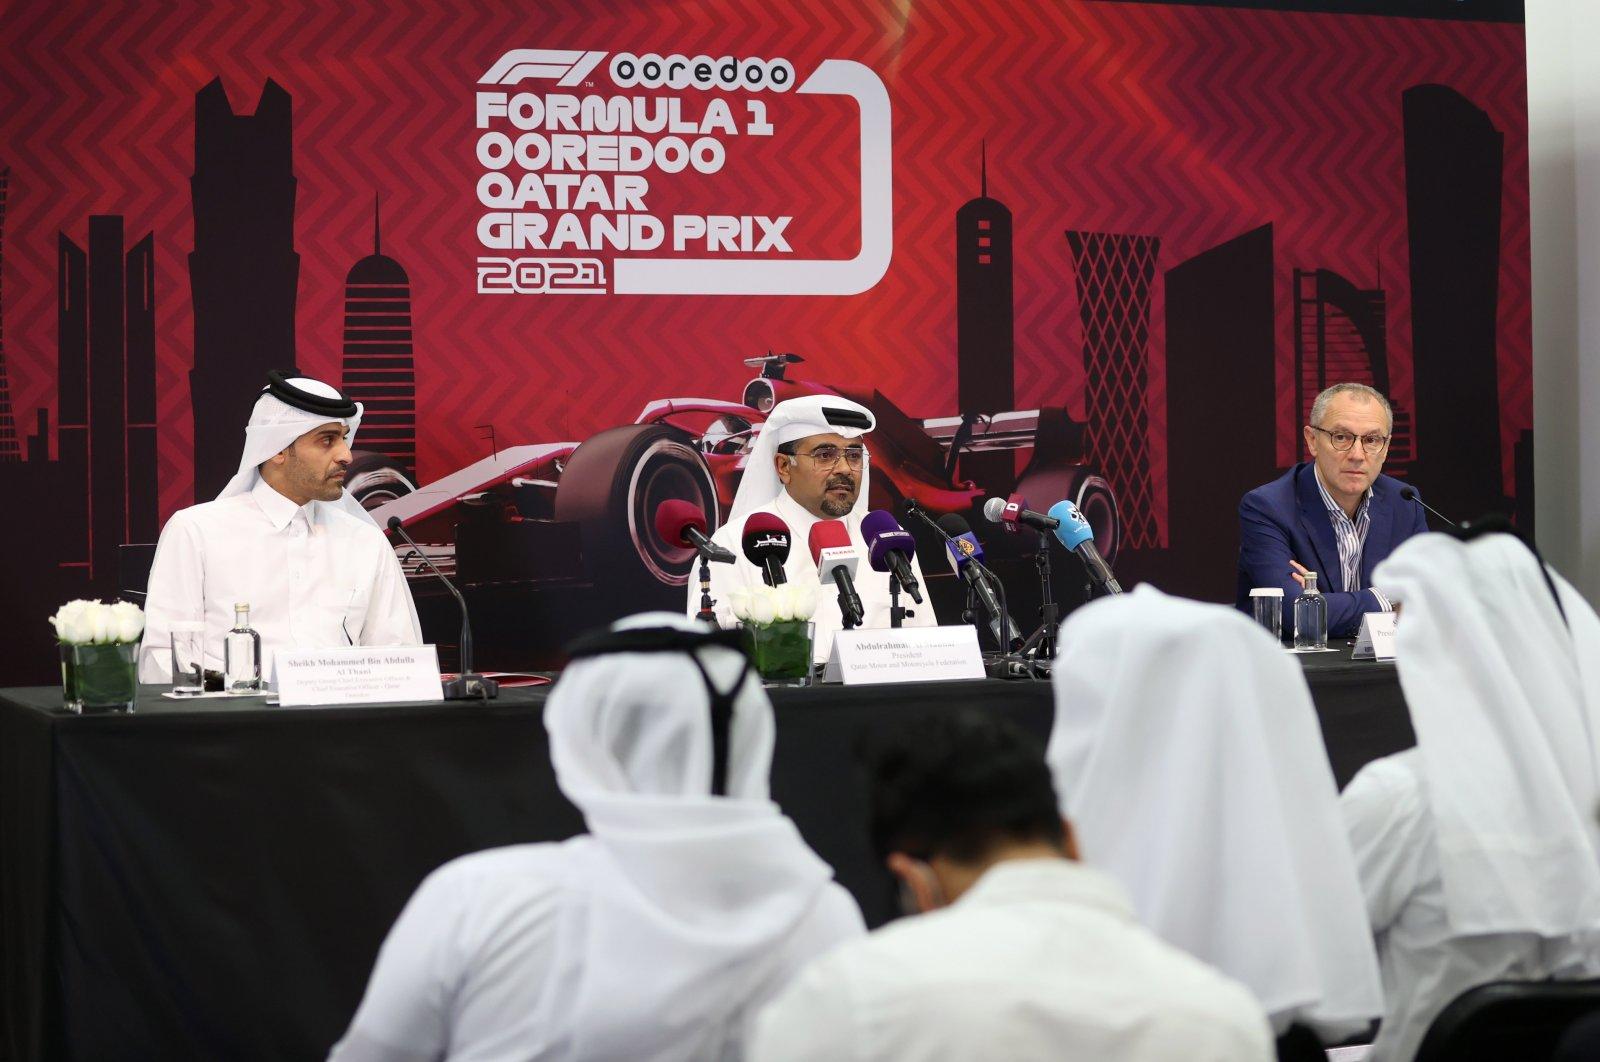 Qatar Ooredoo CEO Sheikh Mohammed bin Abdulla Al Thani (L), Qatar Motor and Motorcycle Federation President Abdulrahman al Mannai (C) and Formula One Group CEO StefanoDomenicali (R) announce the first-ever Qatar Grand Prix at a press conference in Doha, Qatar, Sept. 30, 2021. (Reuters Photo)